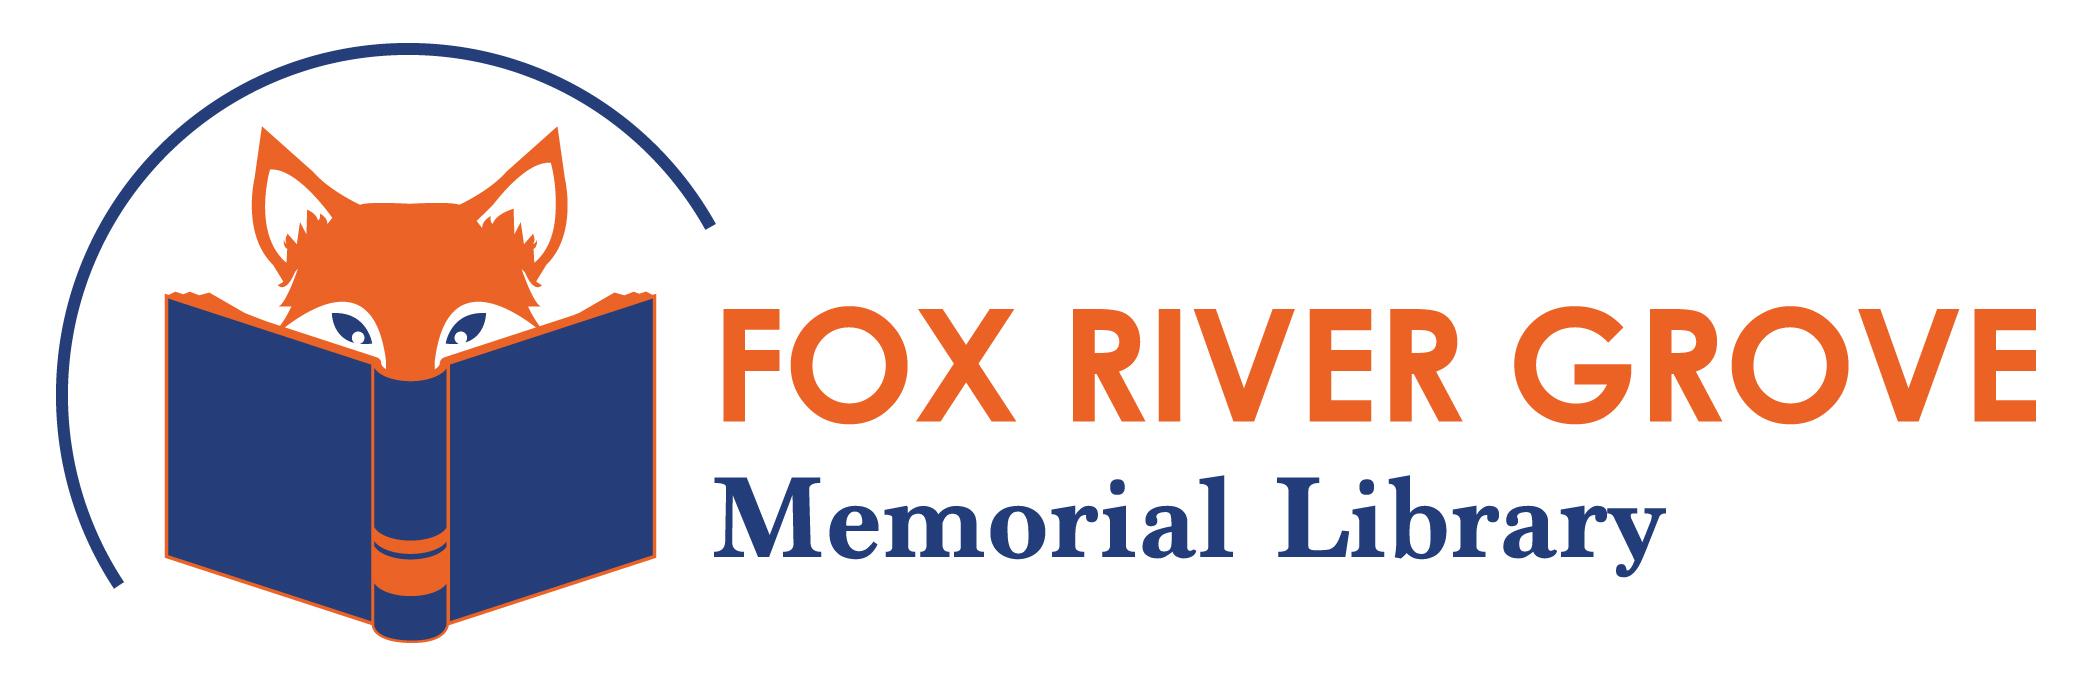 Fox River Grove Memorial Library